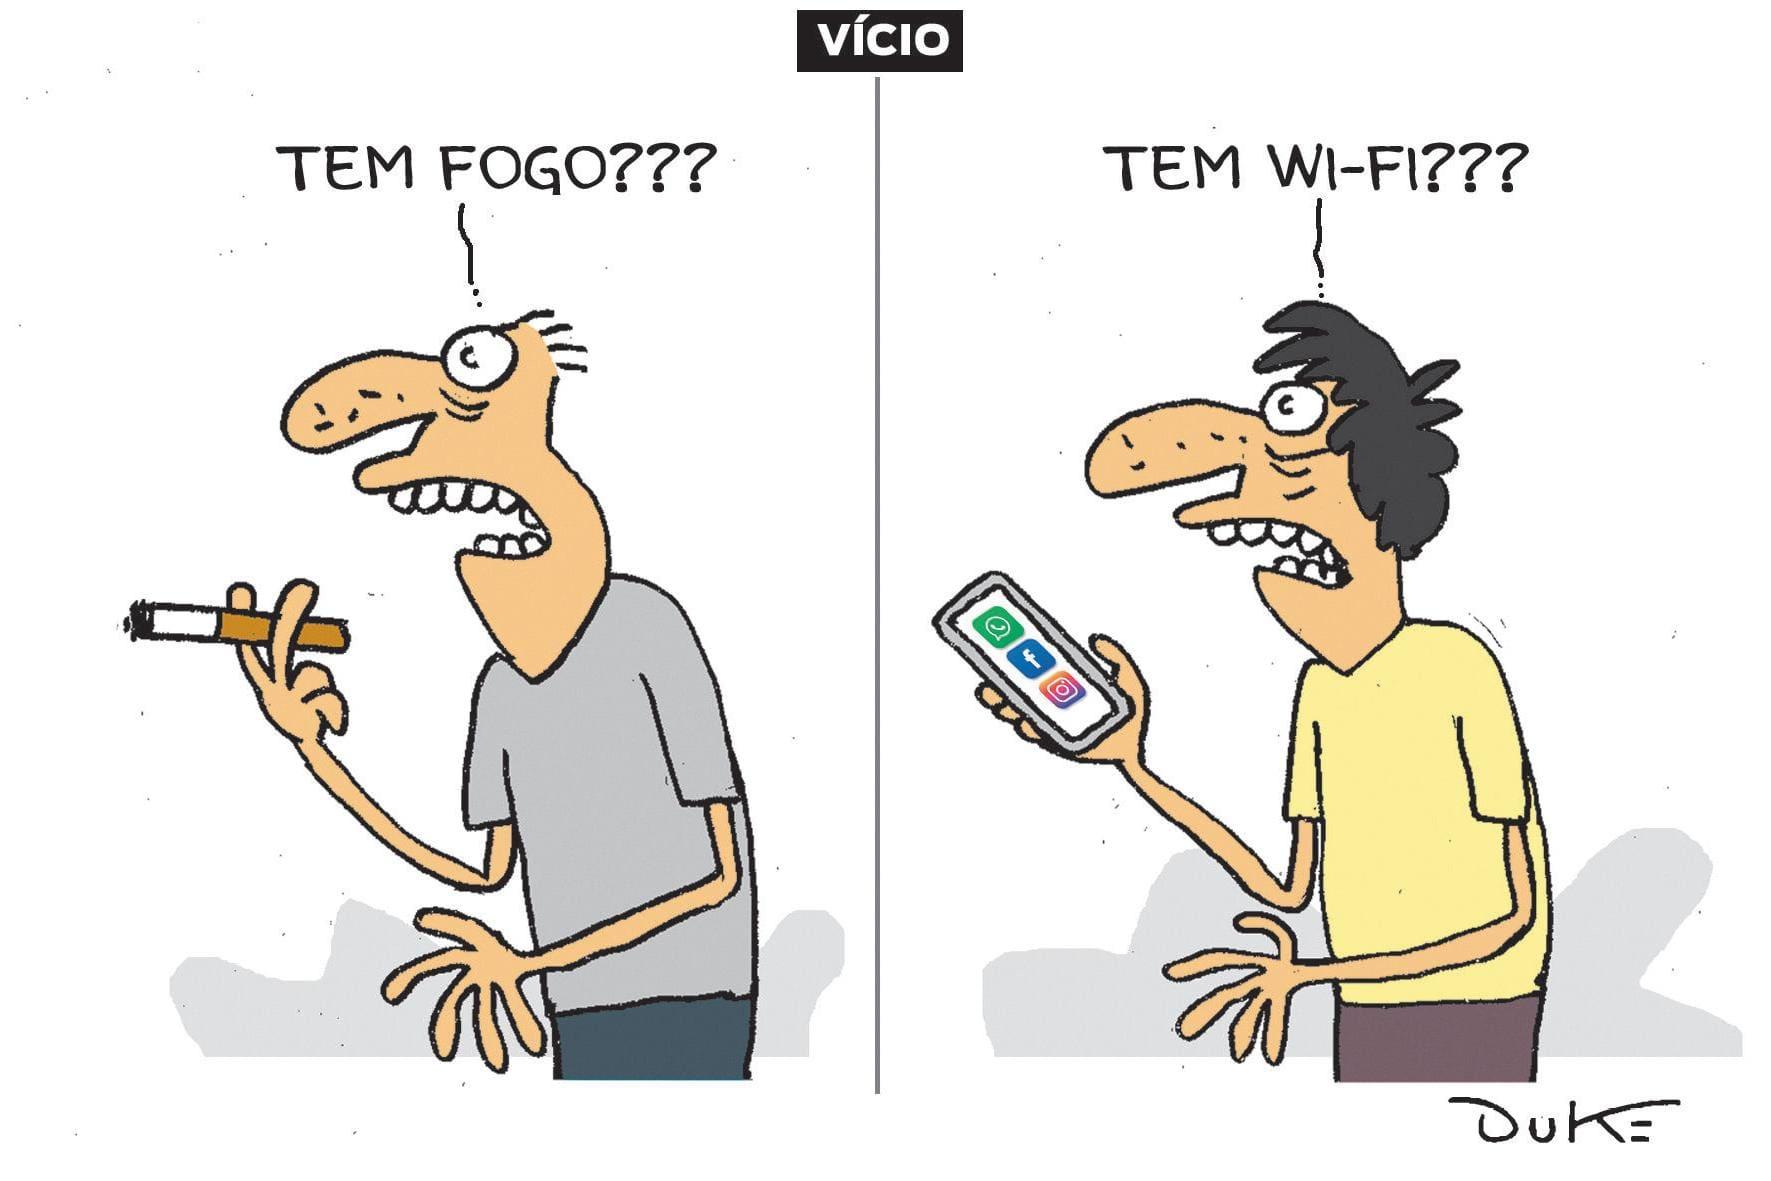 Charge O Tempo 14/01/2019